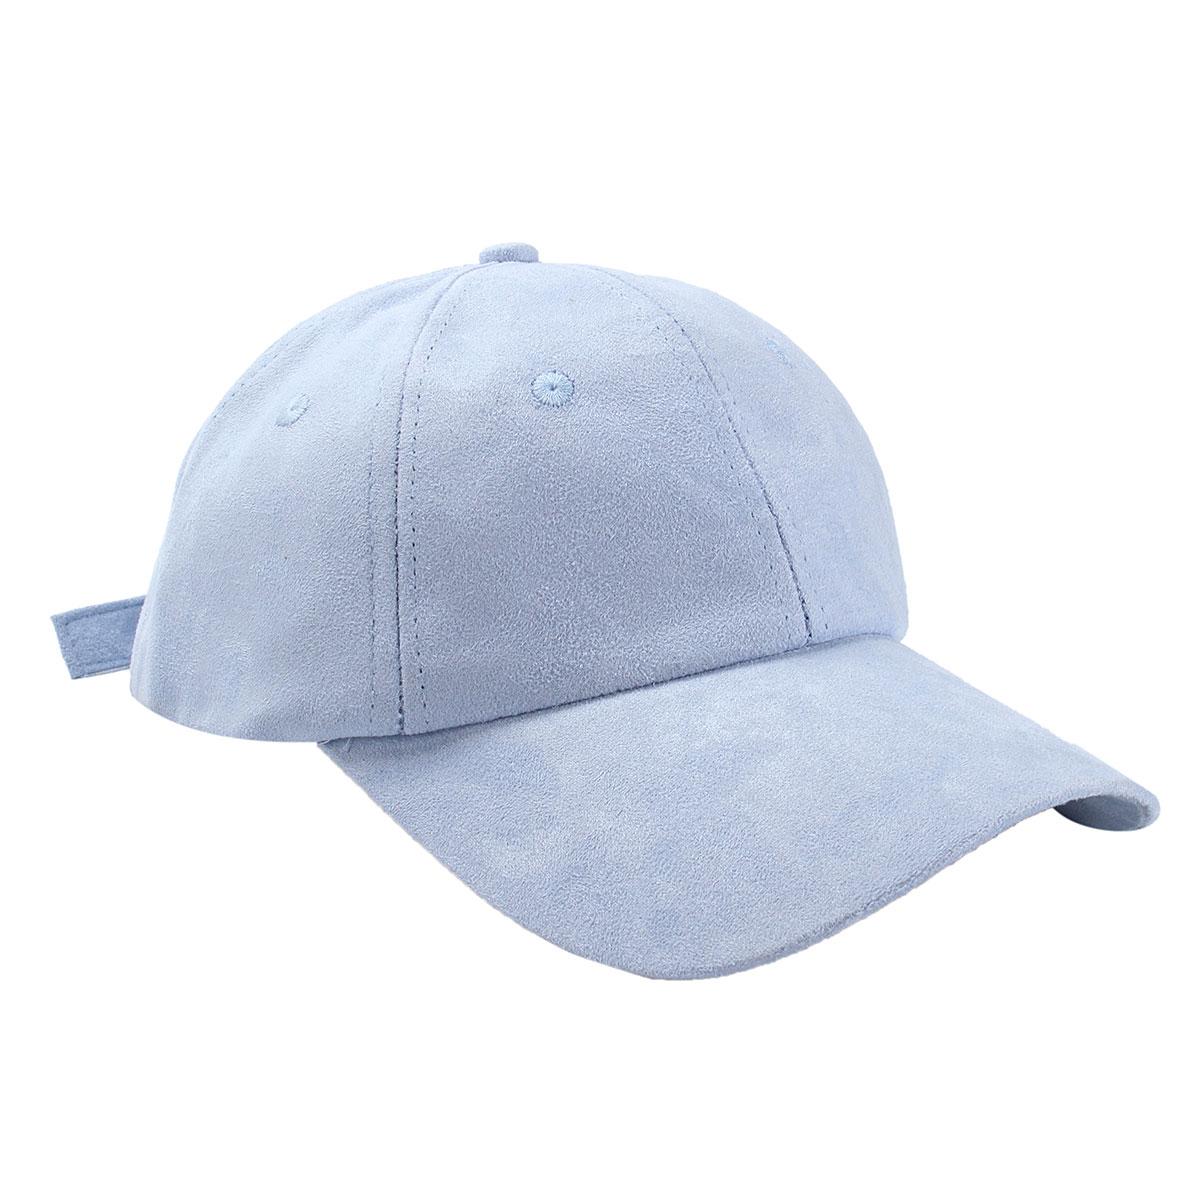 Uinn Adapula Yong Polo Fashion Gaya Orang Hat Topi Baseball Bahan Polos Mursidah Kesempatan Kasual Kulit Suede Warna Biru Muda Pola